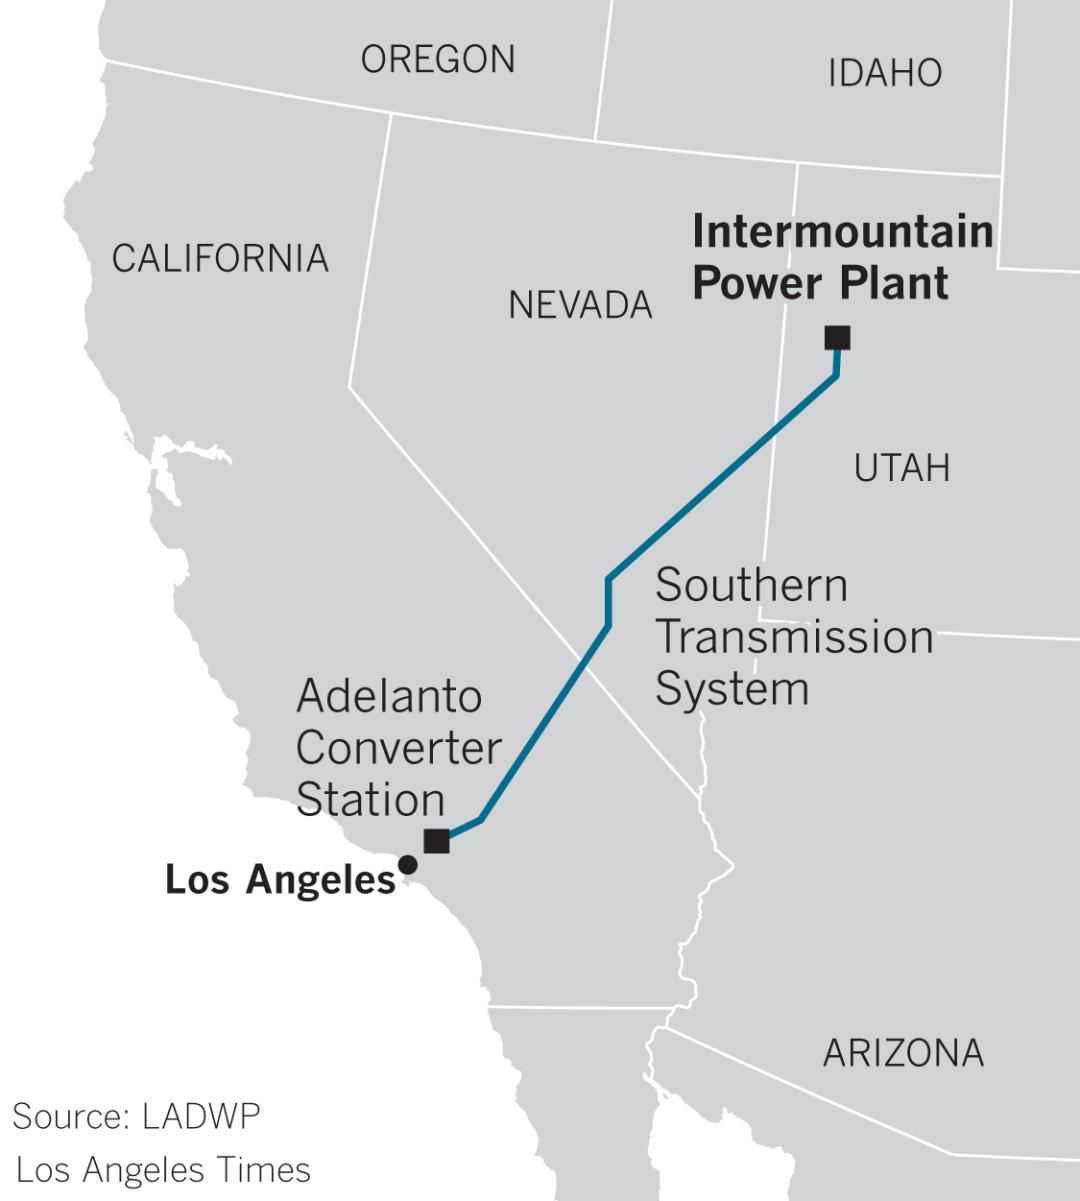 Intermountain Power Plant map